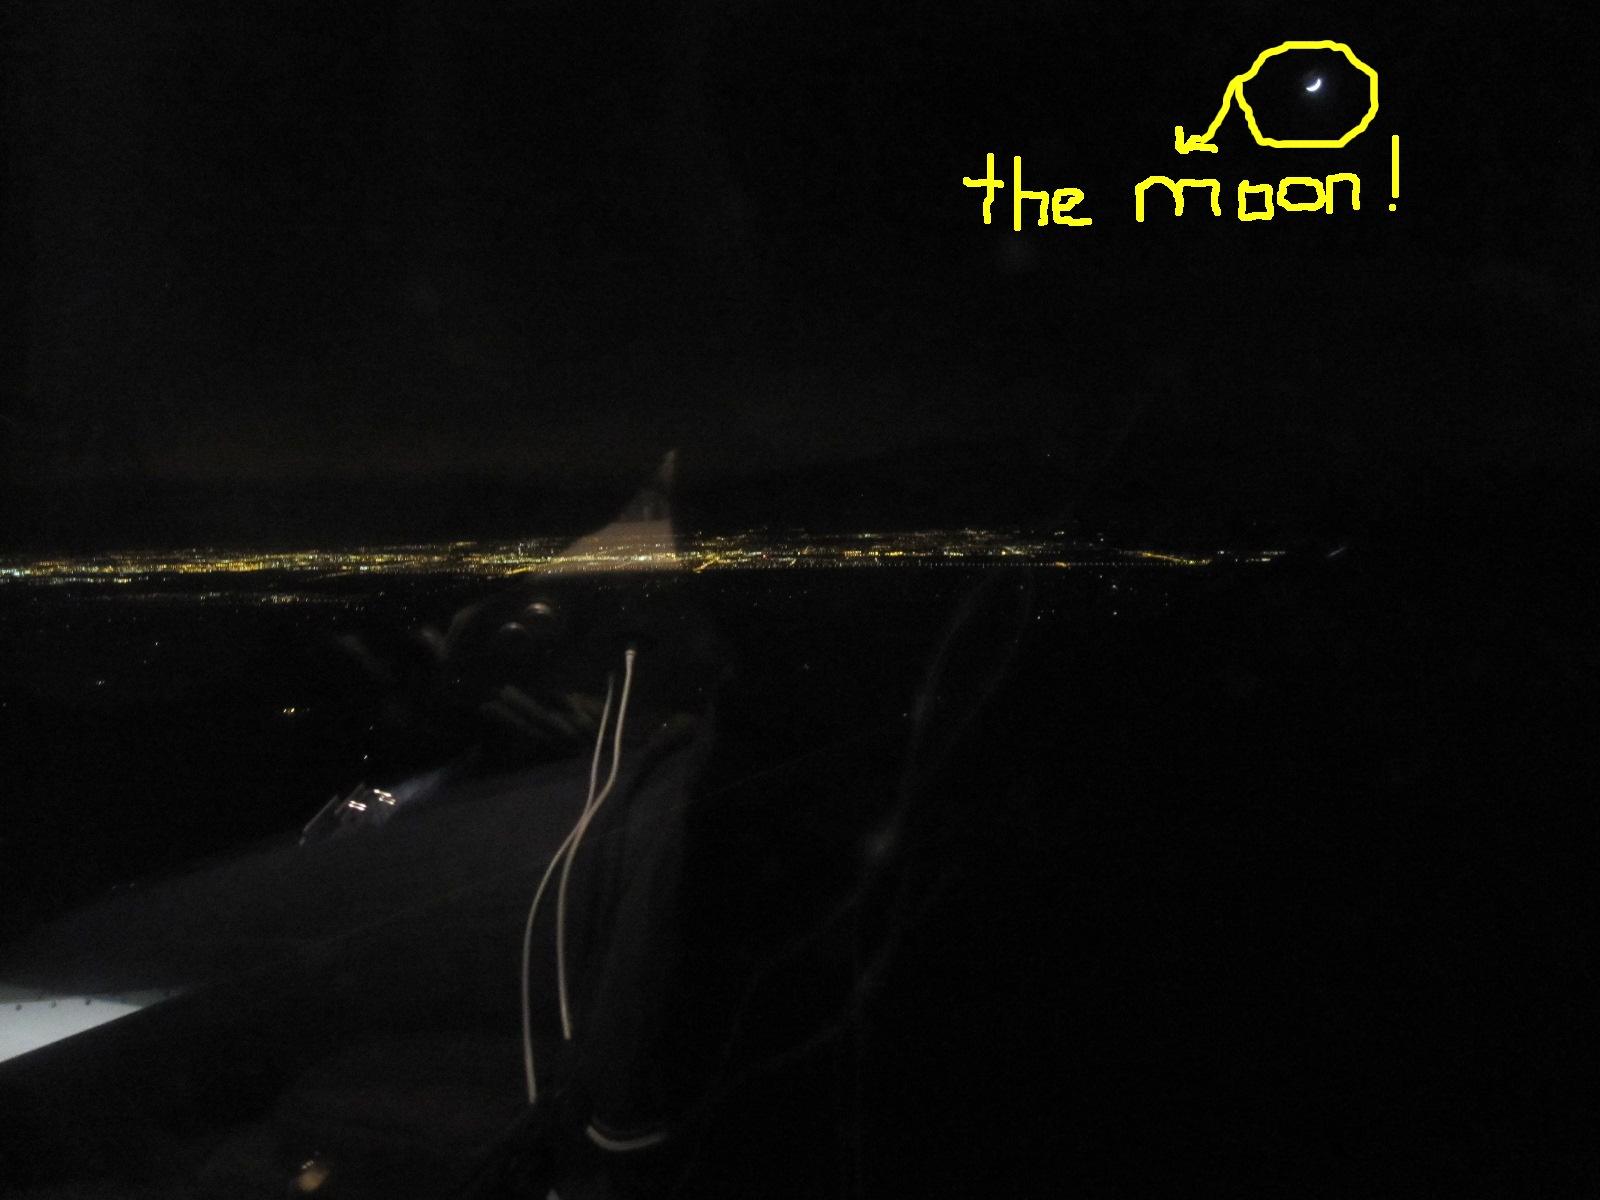 http://1.bp.blogspot.com/-oWbfCKvy5dQ/TaIHcgMHieI/AAAAAAAAA4k/D_FrIvC8AoM/s1600/the+moon1.JPG